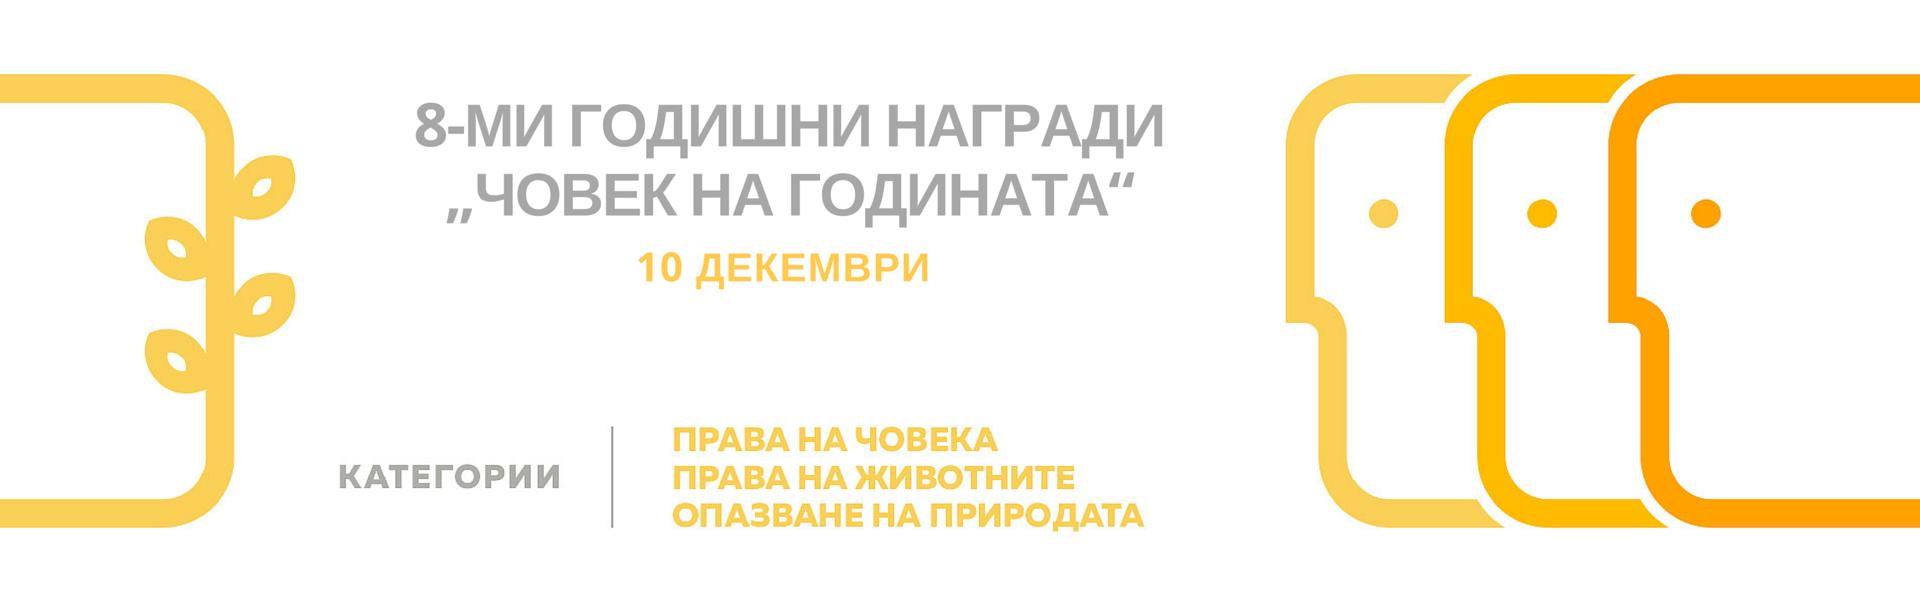 website_results_2015_bg